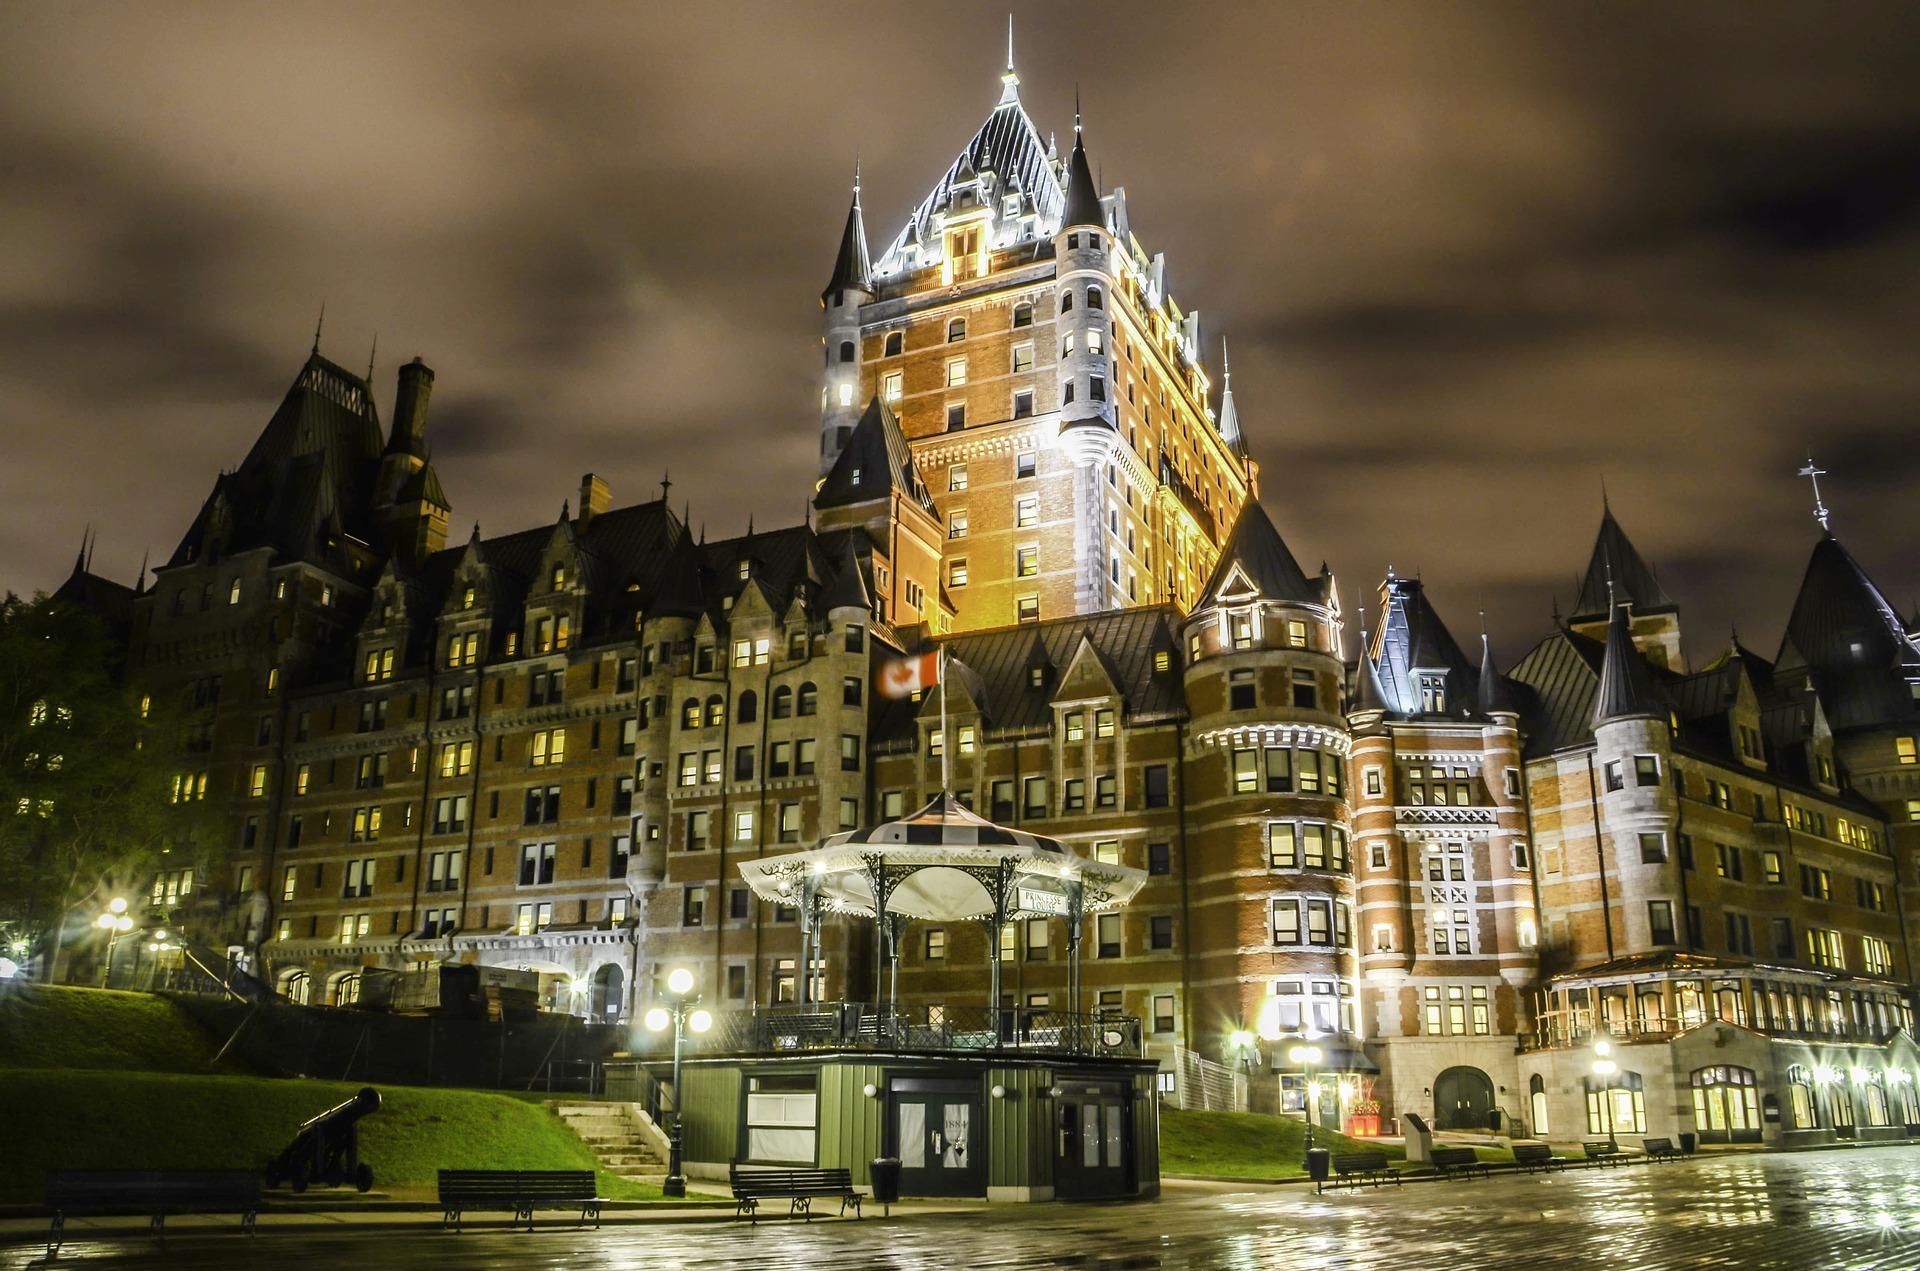 architecture-night-chateau-frontenac.jpg